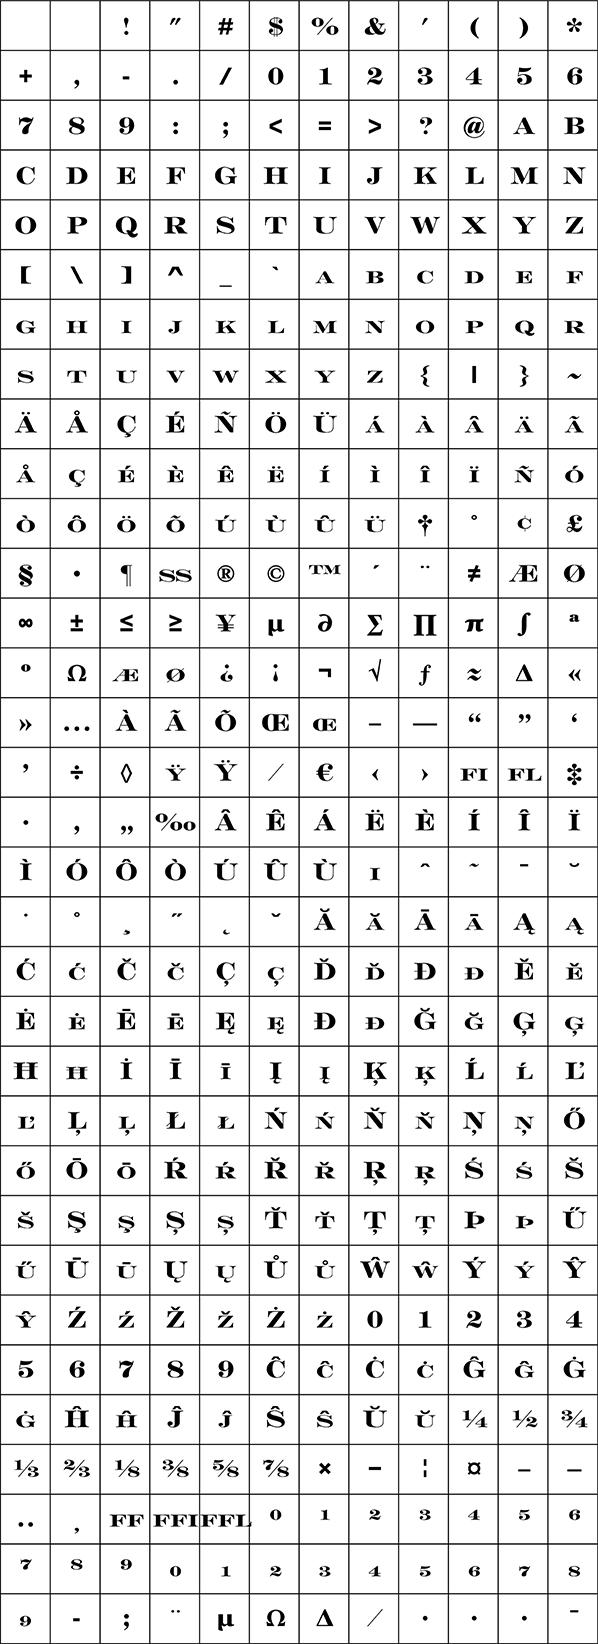 engraversglyphset